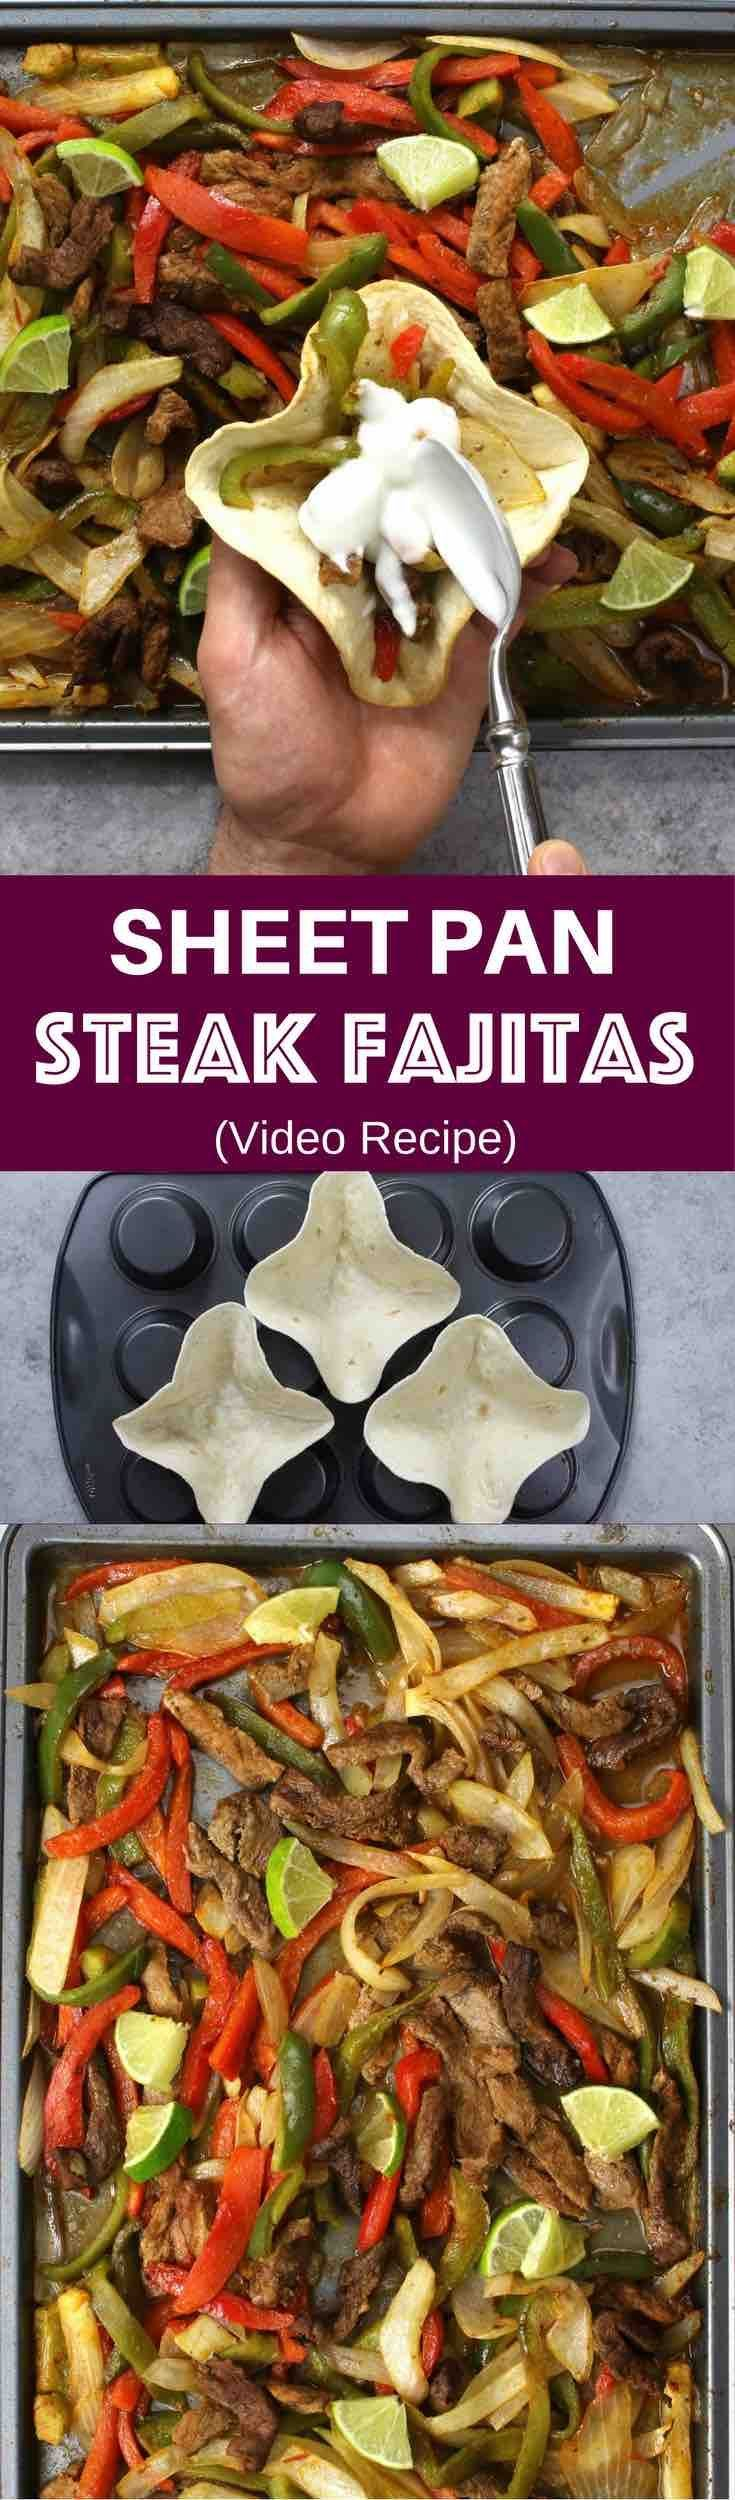 Sheet Pan Steak Fajitas With Taco Bowls – one of t…